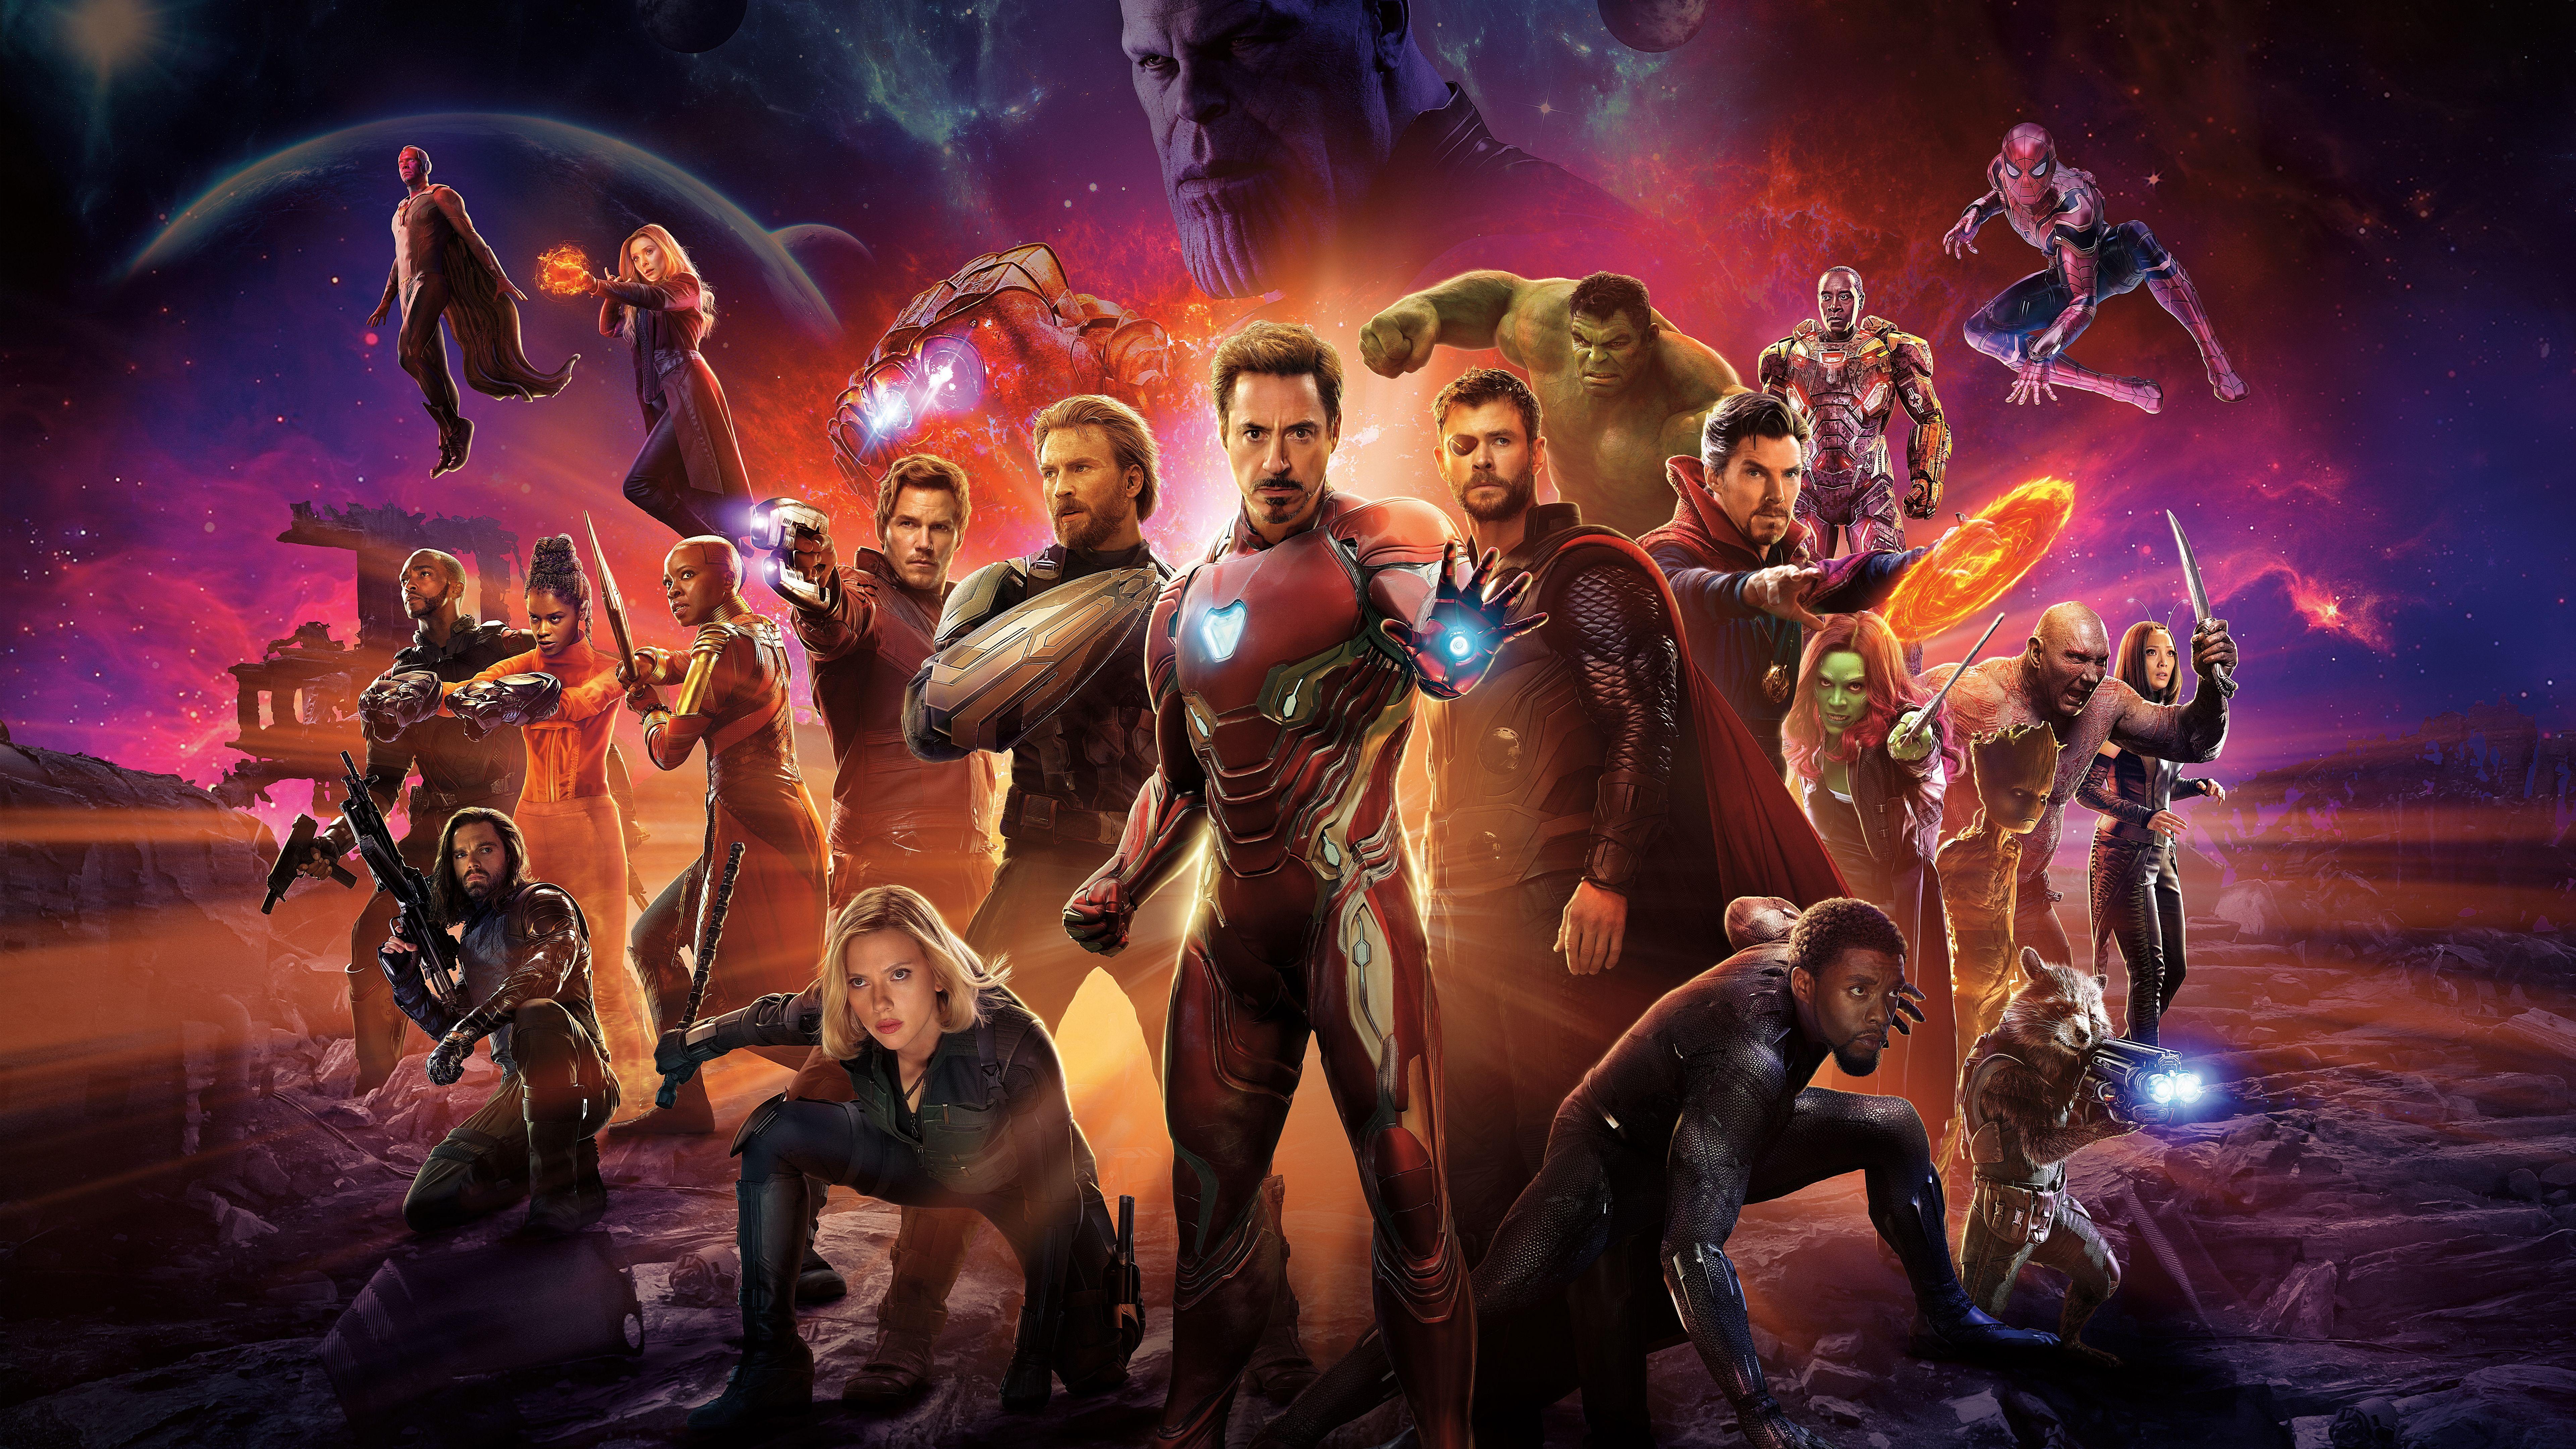 Wallpaper 4k Avengers Infinity War Superheroes Cast 4k 8k Avengers Cast Infinity Superheroes War Vingadores Marvel Vingadores Marvel Filmes